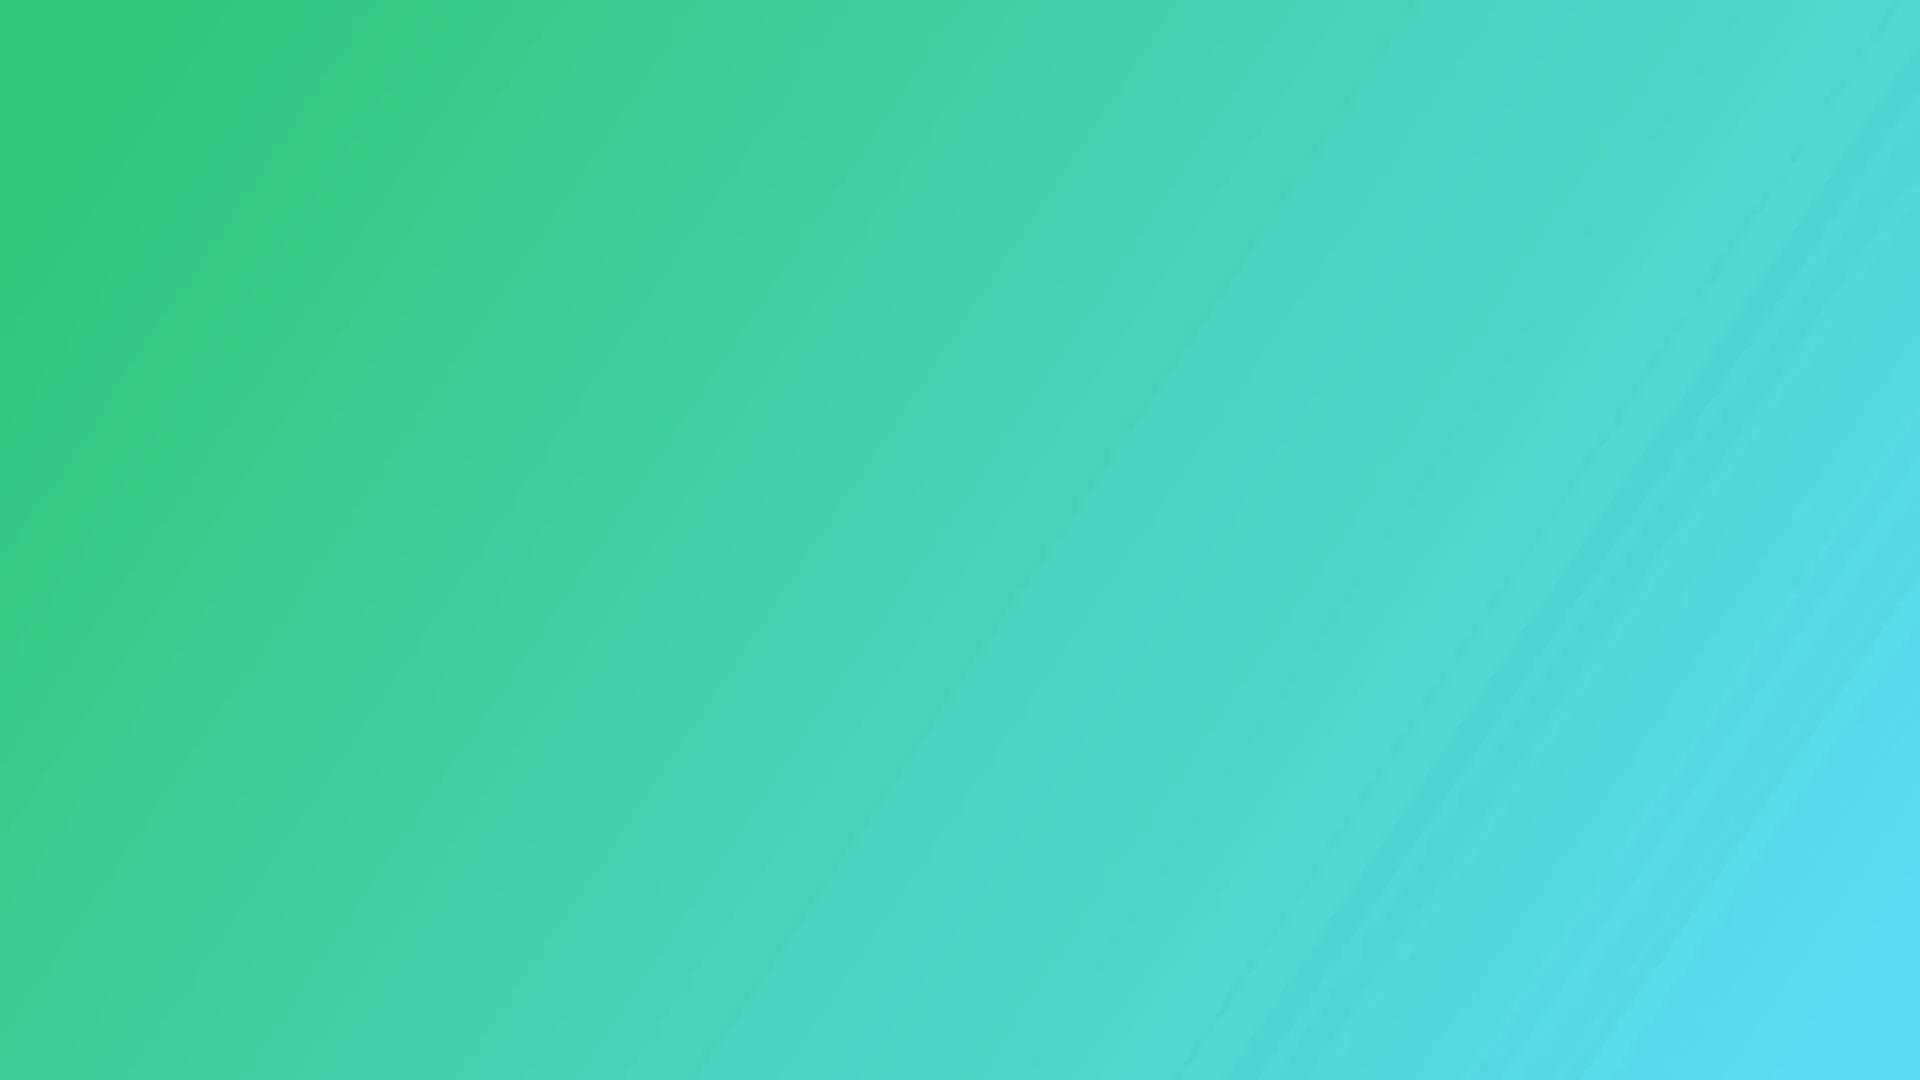 JL9162L Klapp erwachsenen walker farbe